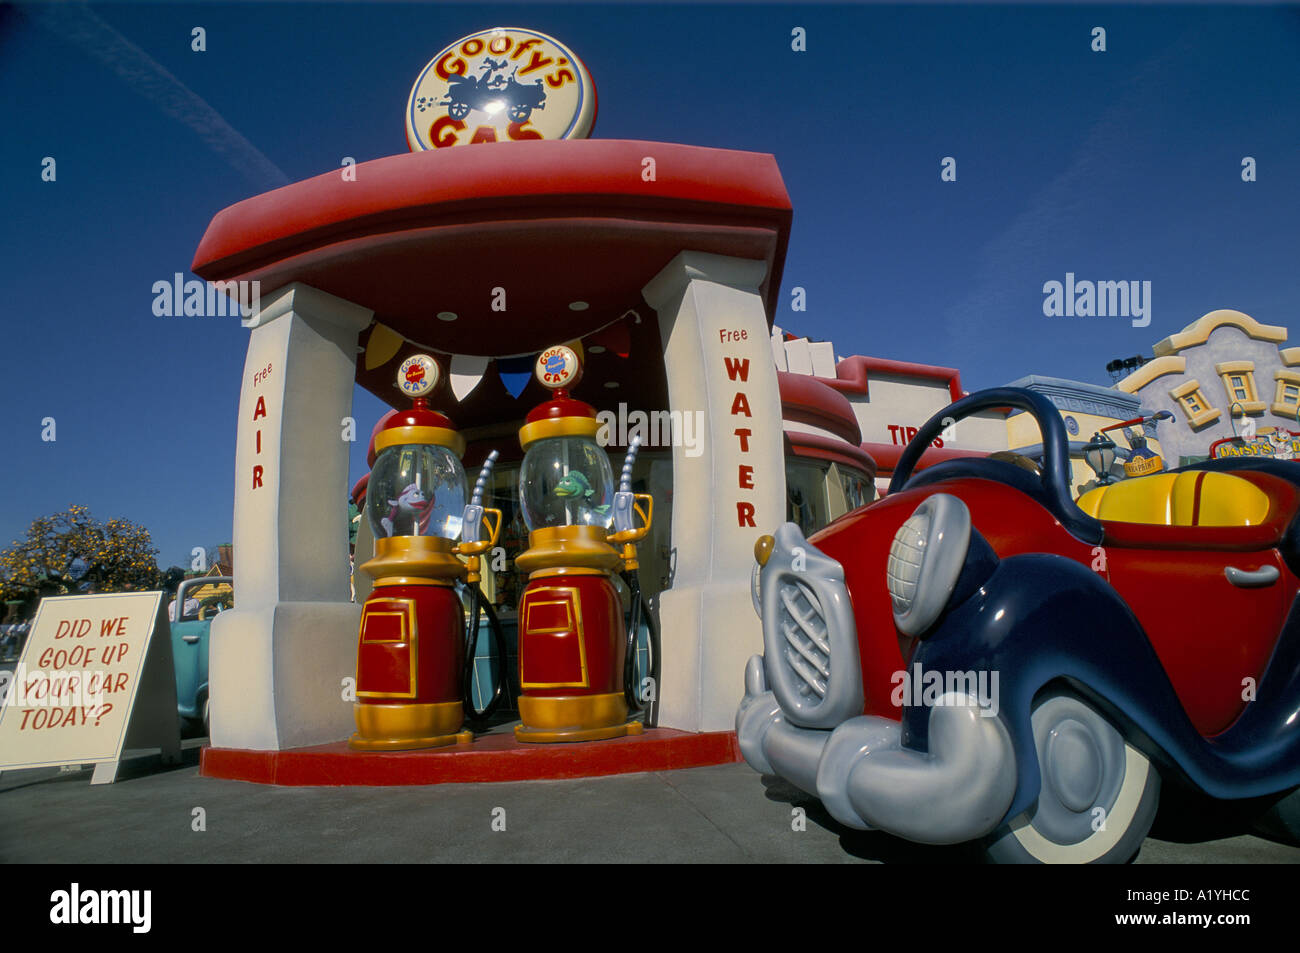 DISNEYLAND IN LOS ANGELES CALIFORNIA GOOFY'S GAS STATION TOONTOWN 1992 - Stock Image